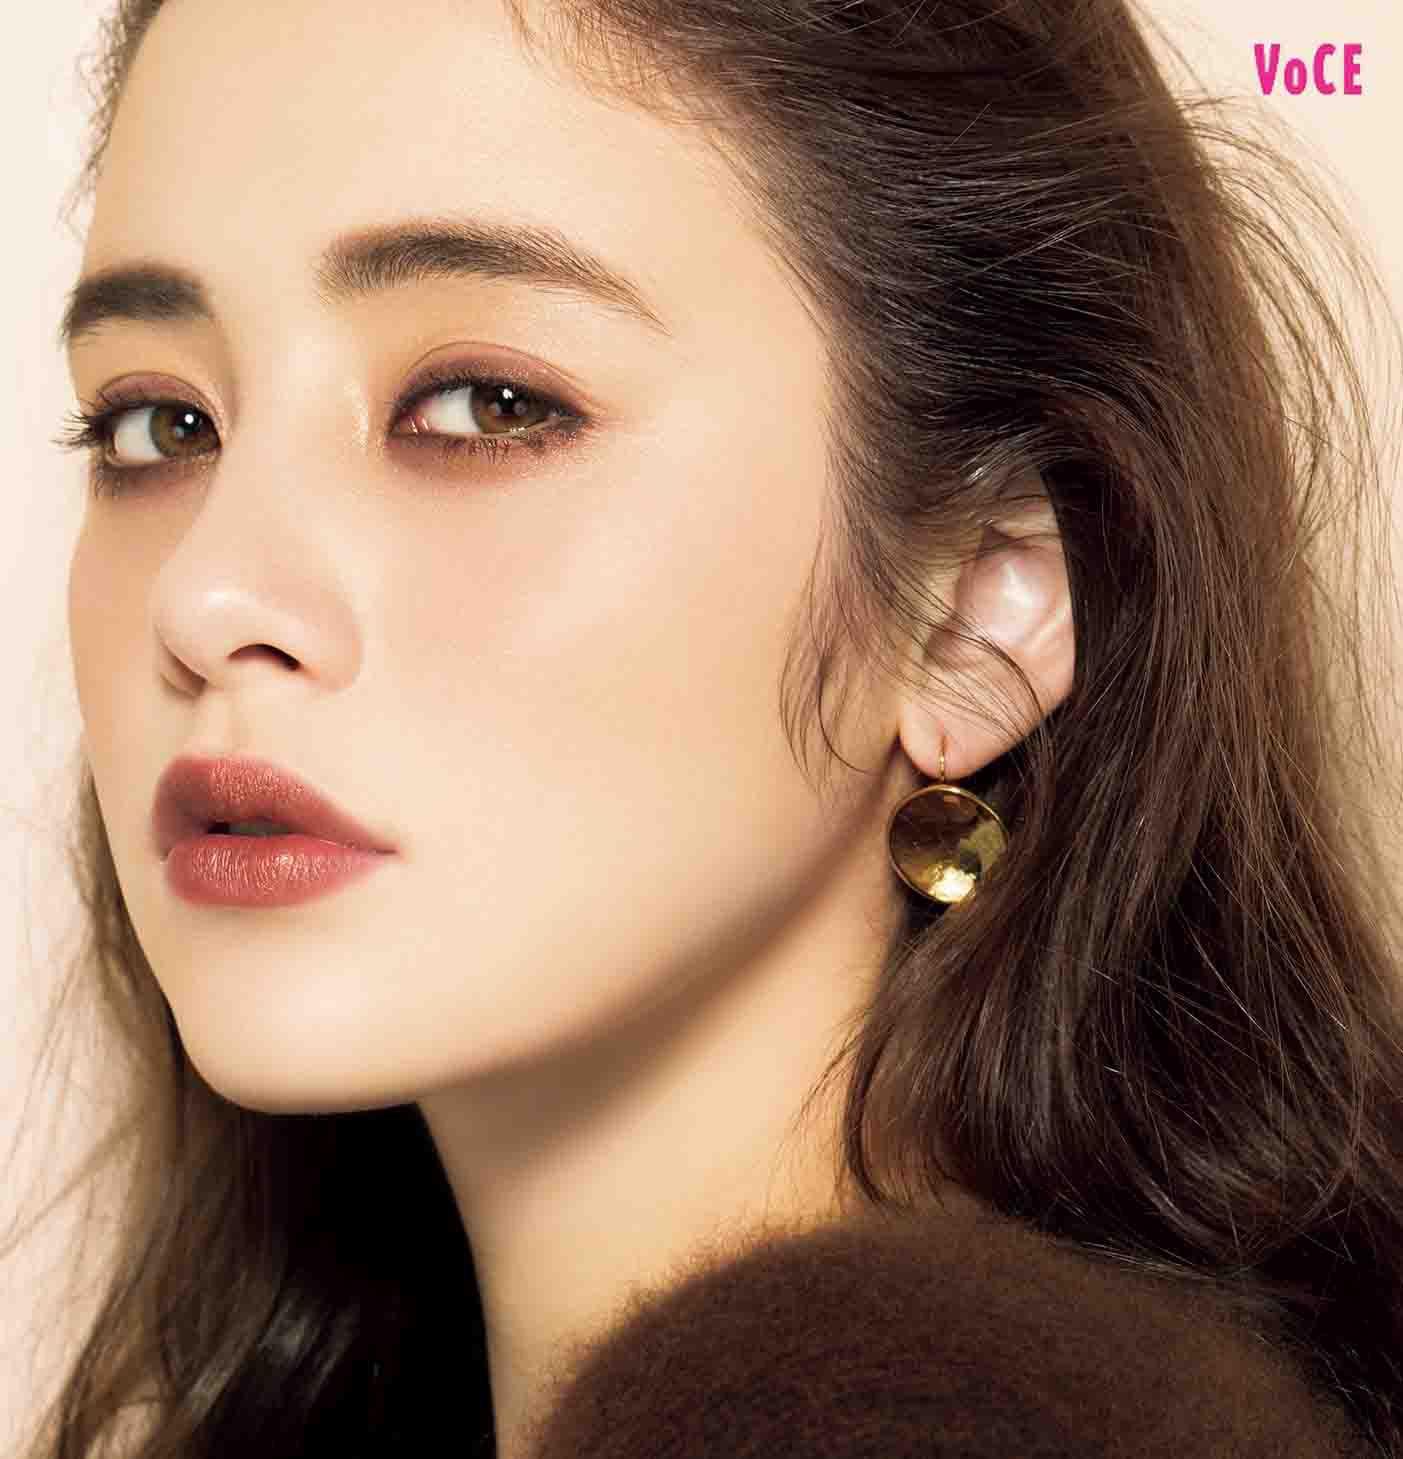 「Makeup」おしゃれまとめの人気アイデア|Pinterest|Chermaine Cheng カラーメイク